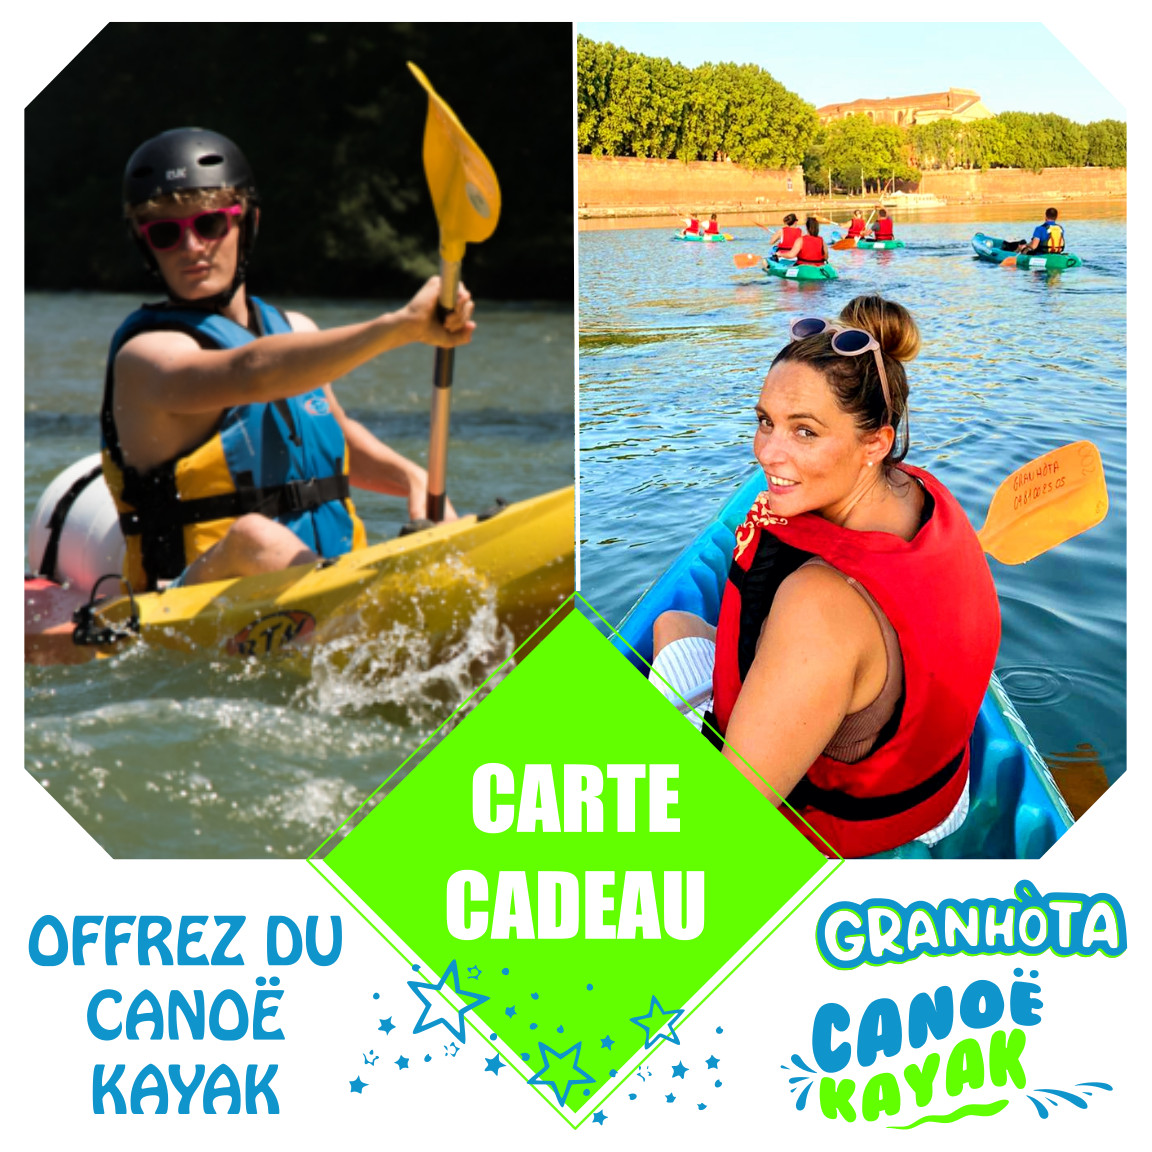 carte cadeau canoe kayak